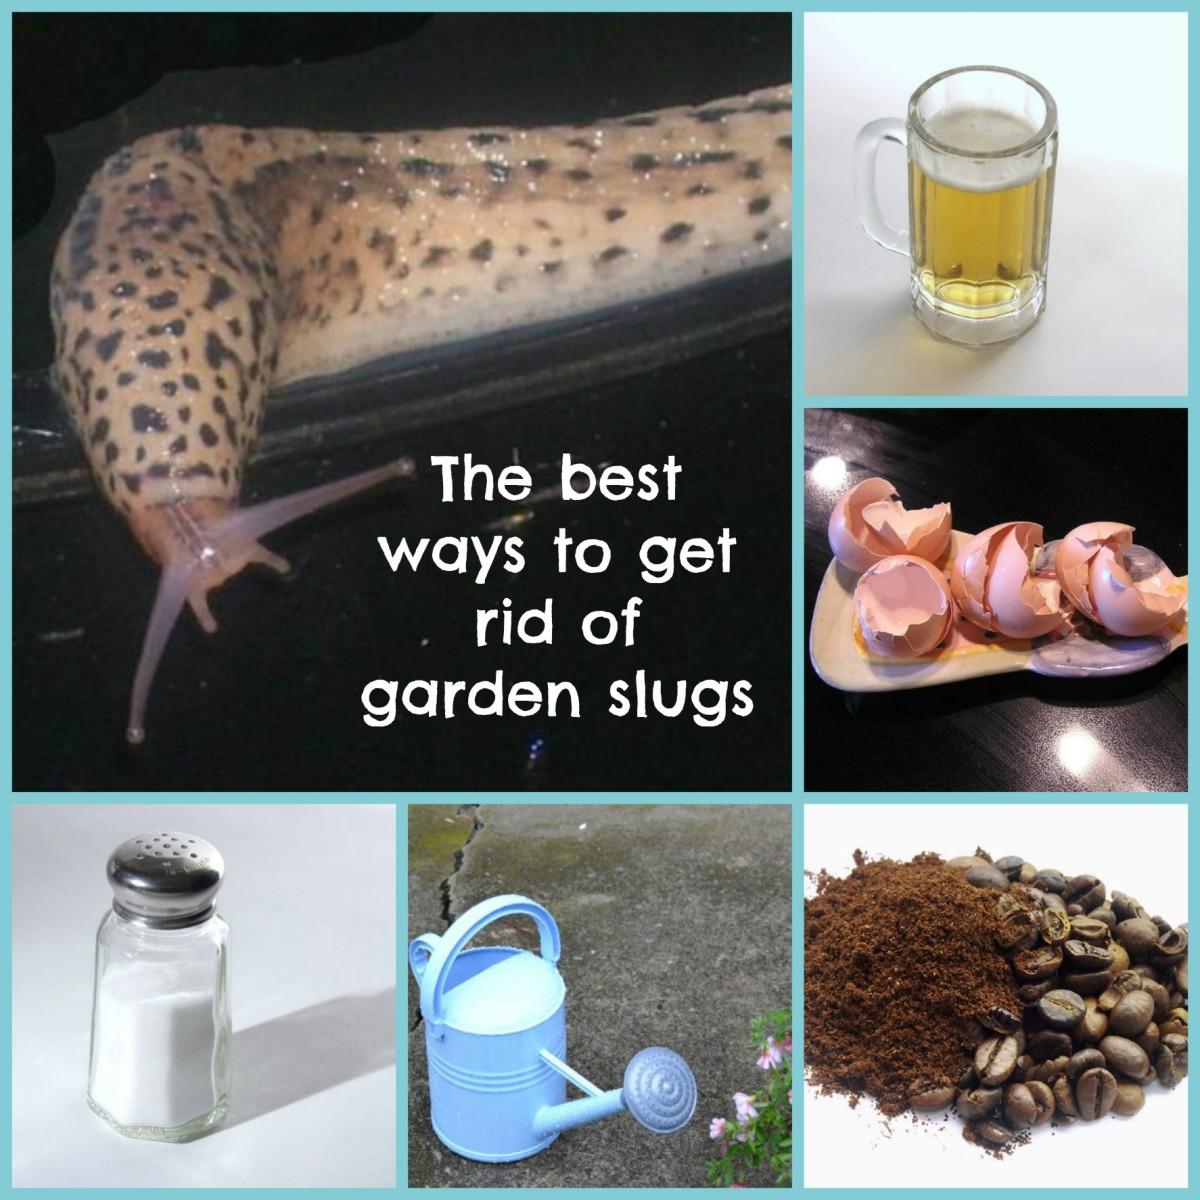 8 Ways to Get Rid of Slugs in Your Garden